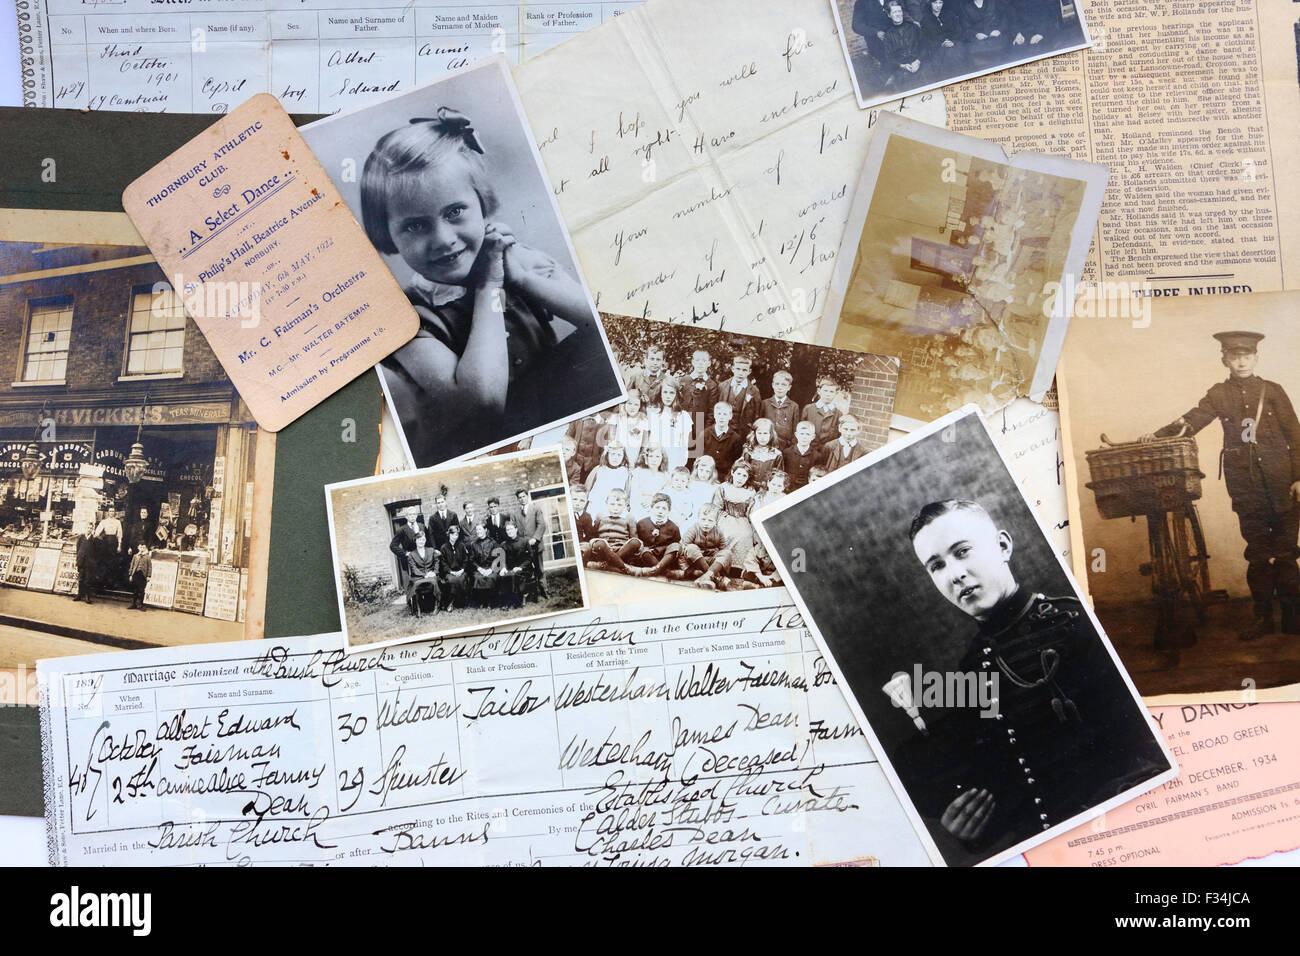 Genealogia risalente vecchie fotografie